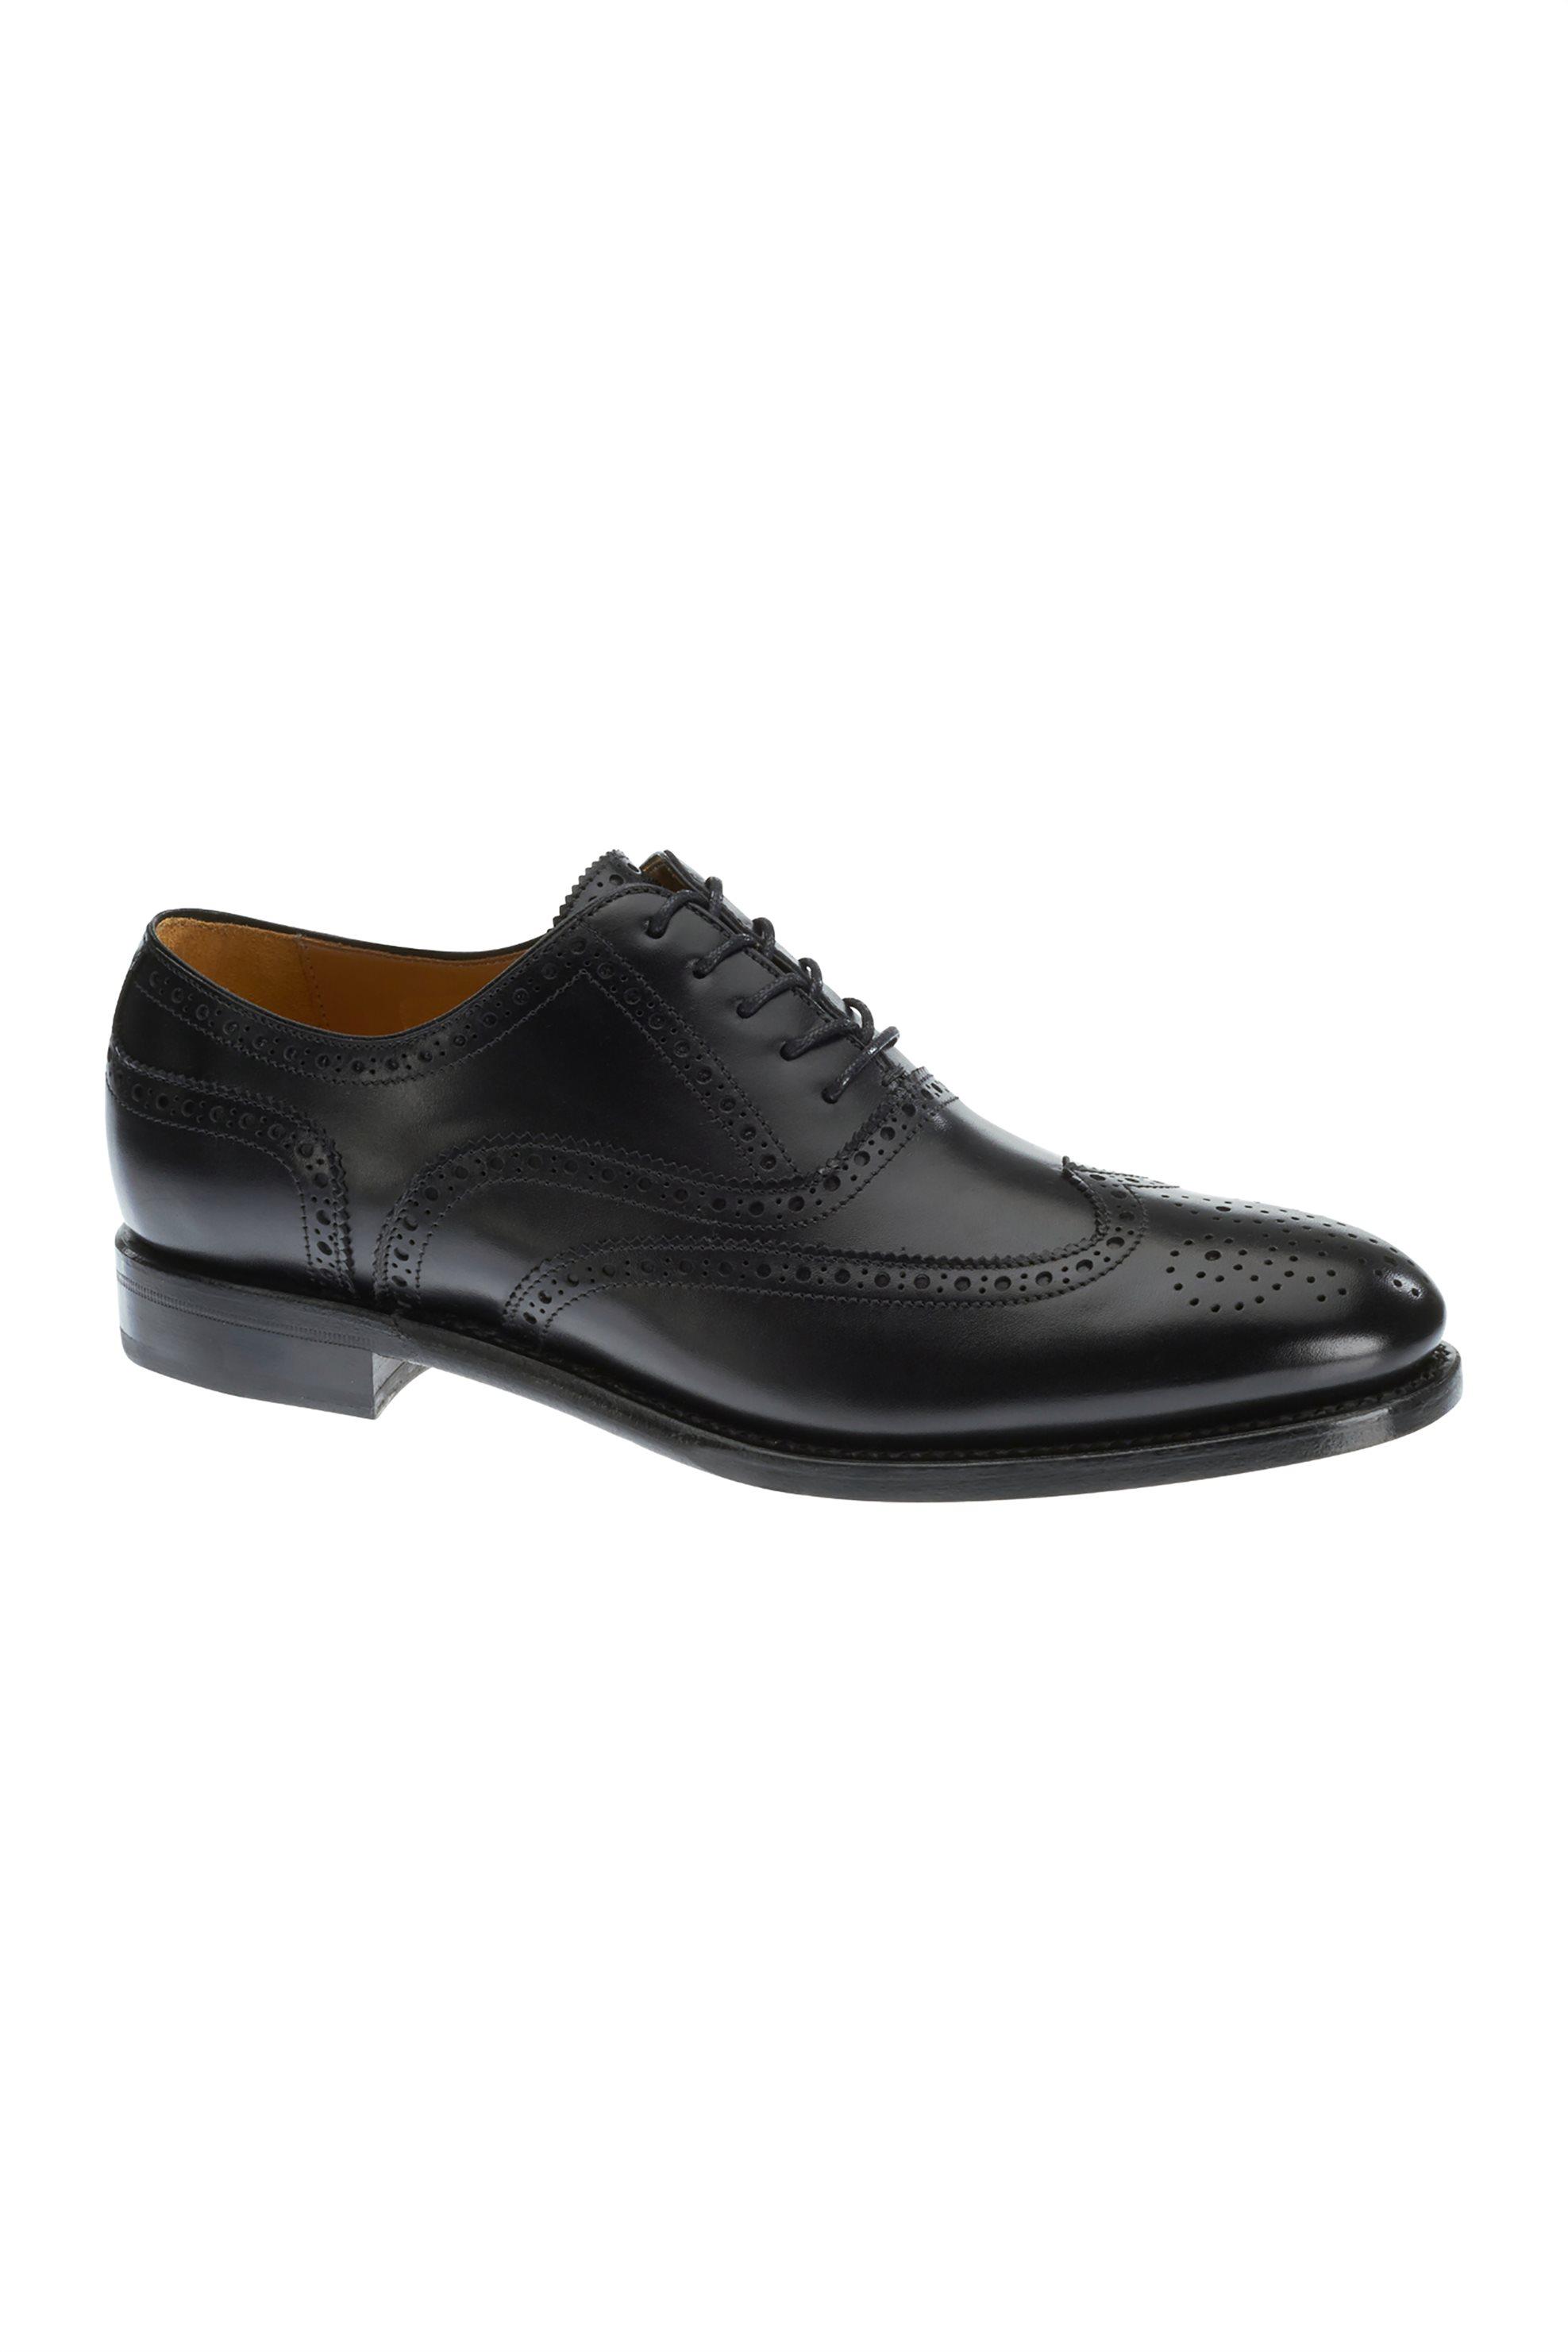 Notos Sebago ανδρικά oxford παπούτσια Cibeles FGL – L70013K0-902 – Μαύρο c647471ab4c